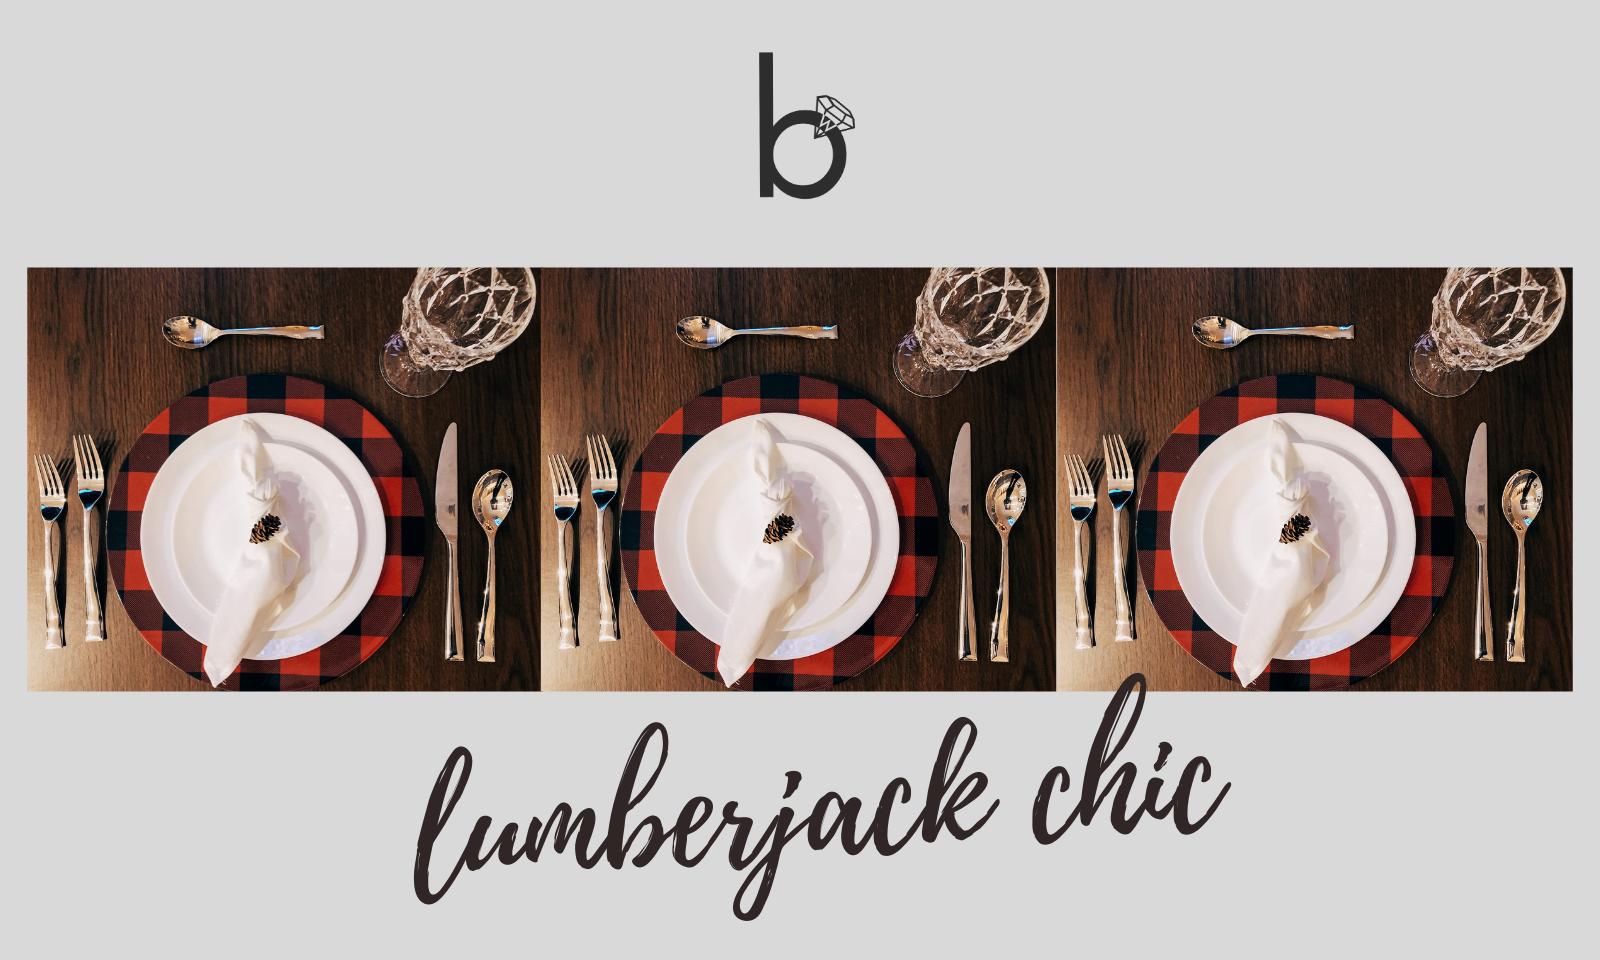 Lumberjack Chic Table Setting